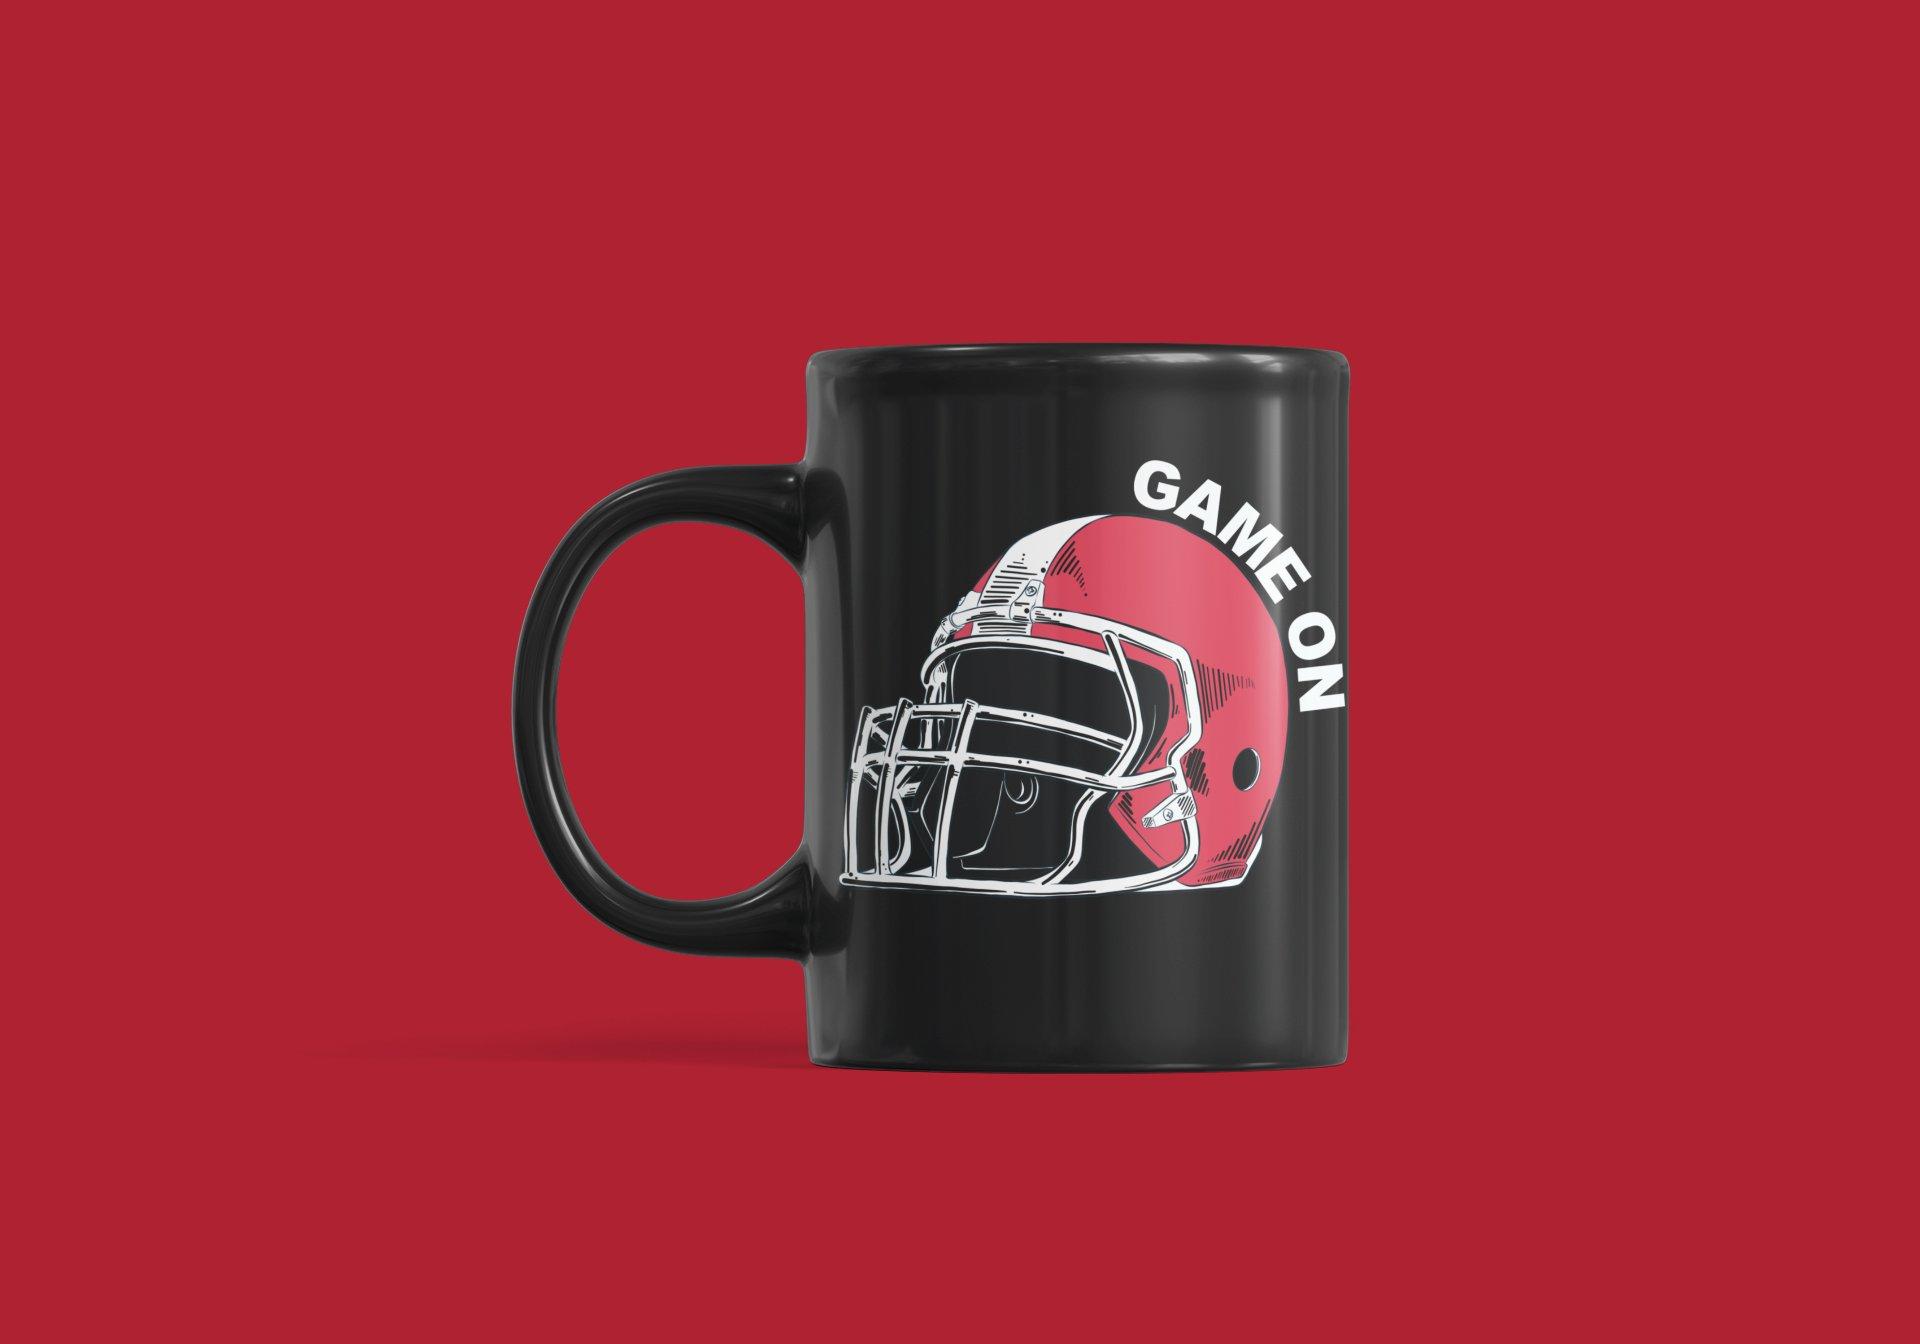 minimalistic-mockup-of-an-11-oz-mug-with-a-customizable-background-2377-el1